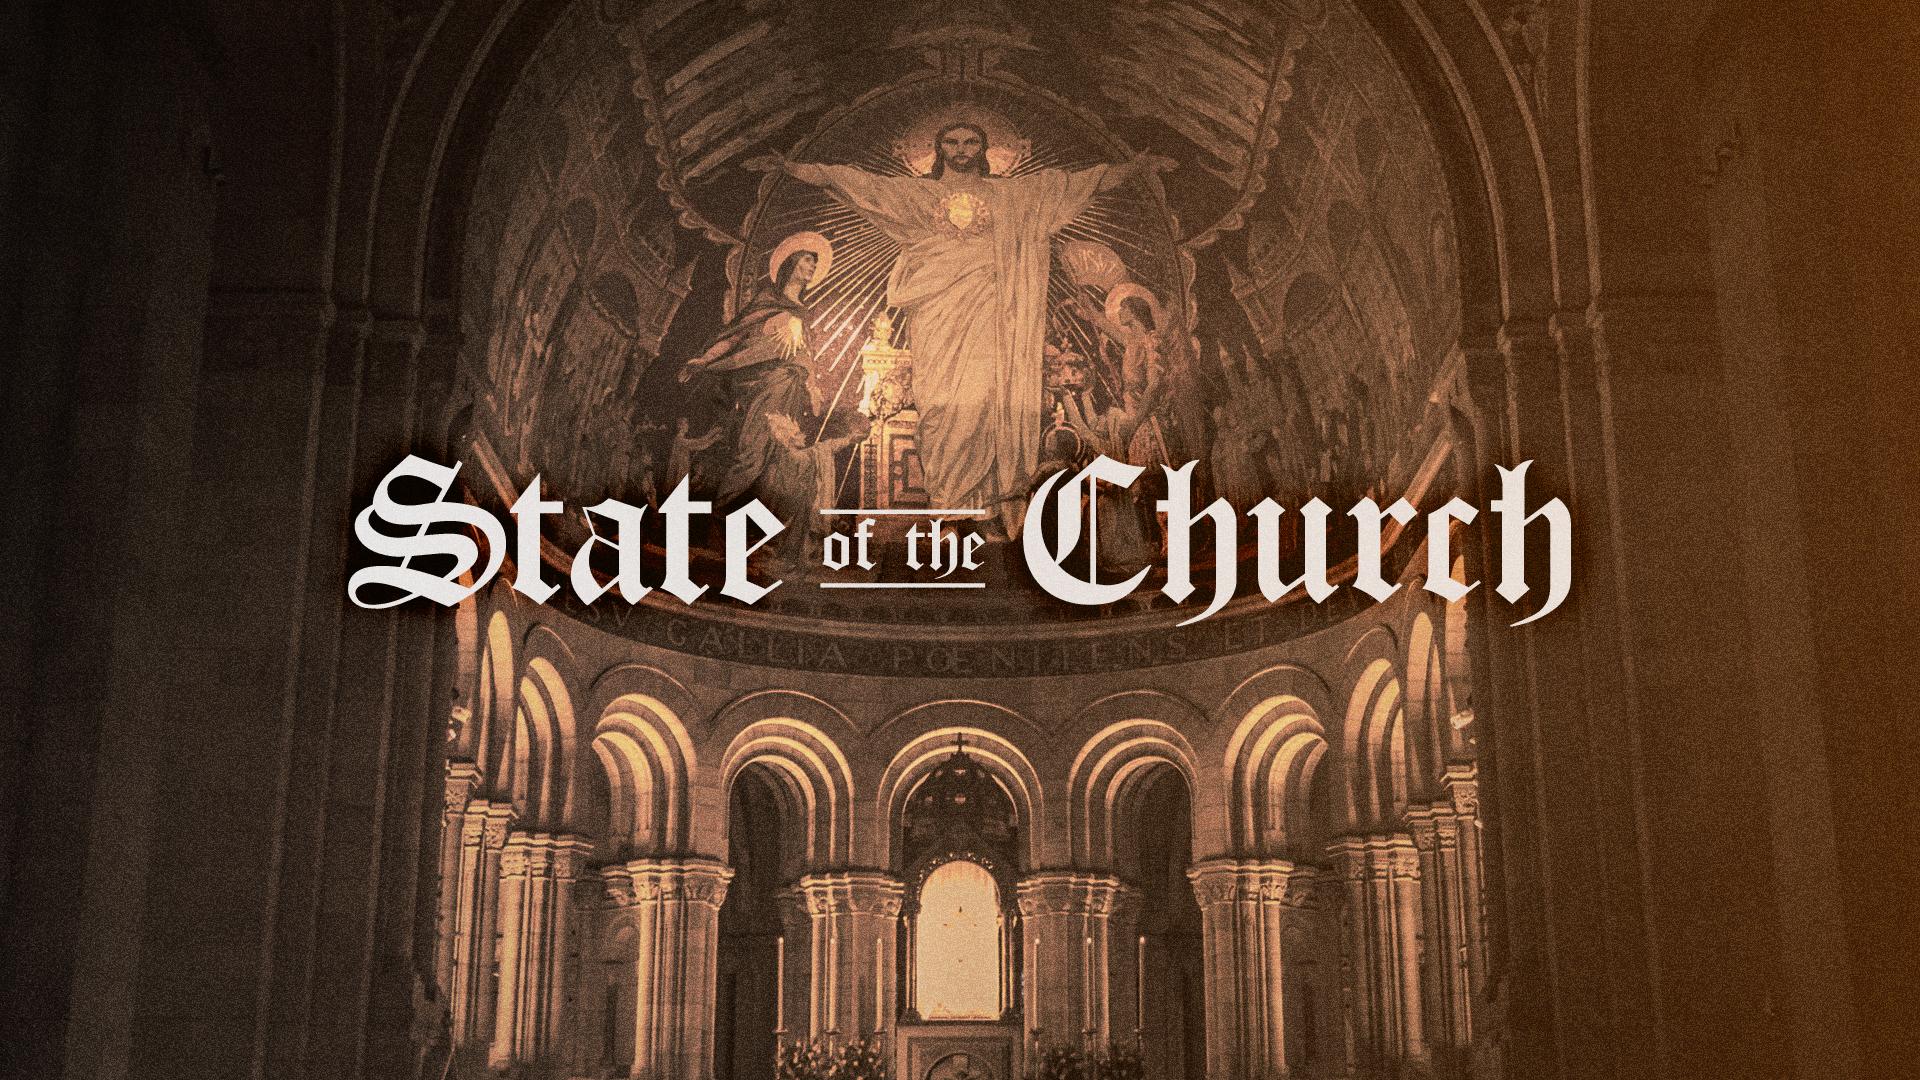 state_of_the_church_artboard_1.jpg